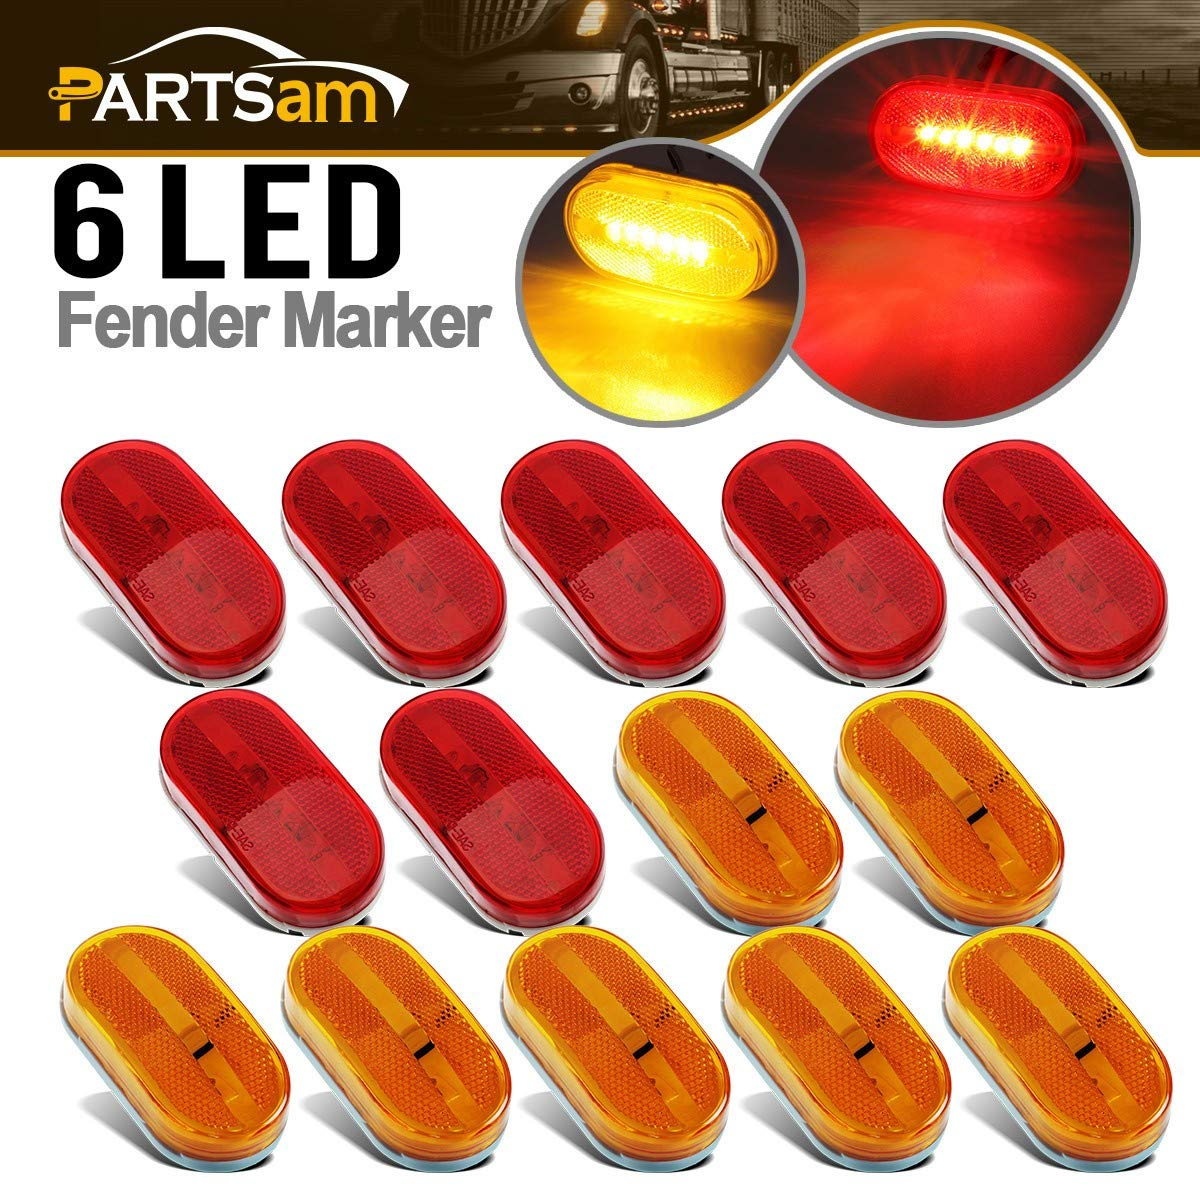 Partsam 14x Rectangle Reflectorized Side Marker Lights 4 x 2 RV Camper Red/Amber 6 Diodes, Led Trailer Clearance Lights w/Reflex Reflector, Rectangular trailer lights, White Base, Surface mount